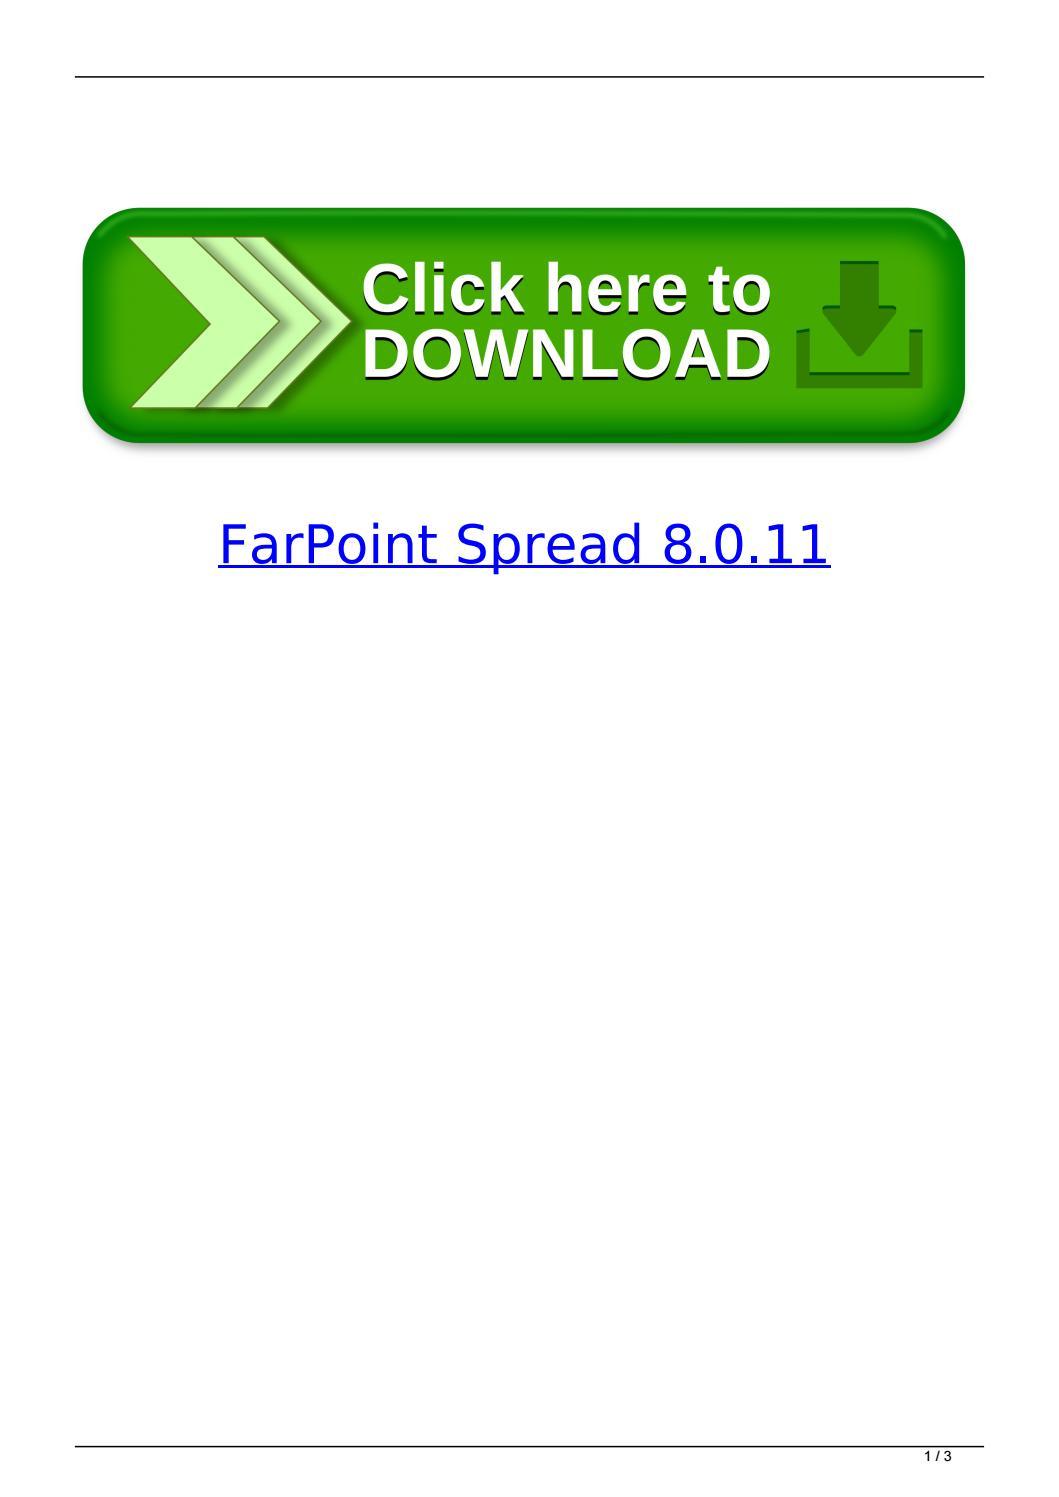 Farpoint Spreadsheet In Farpoint Spread 8.0.11Vijecnaakyb  Issuu